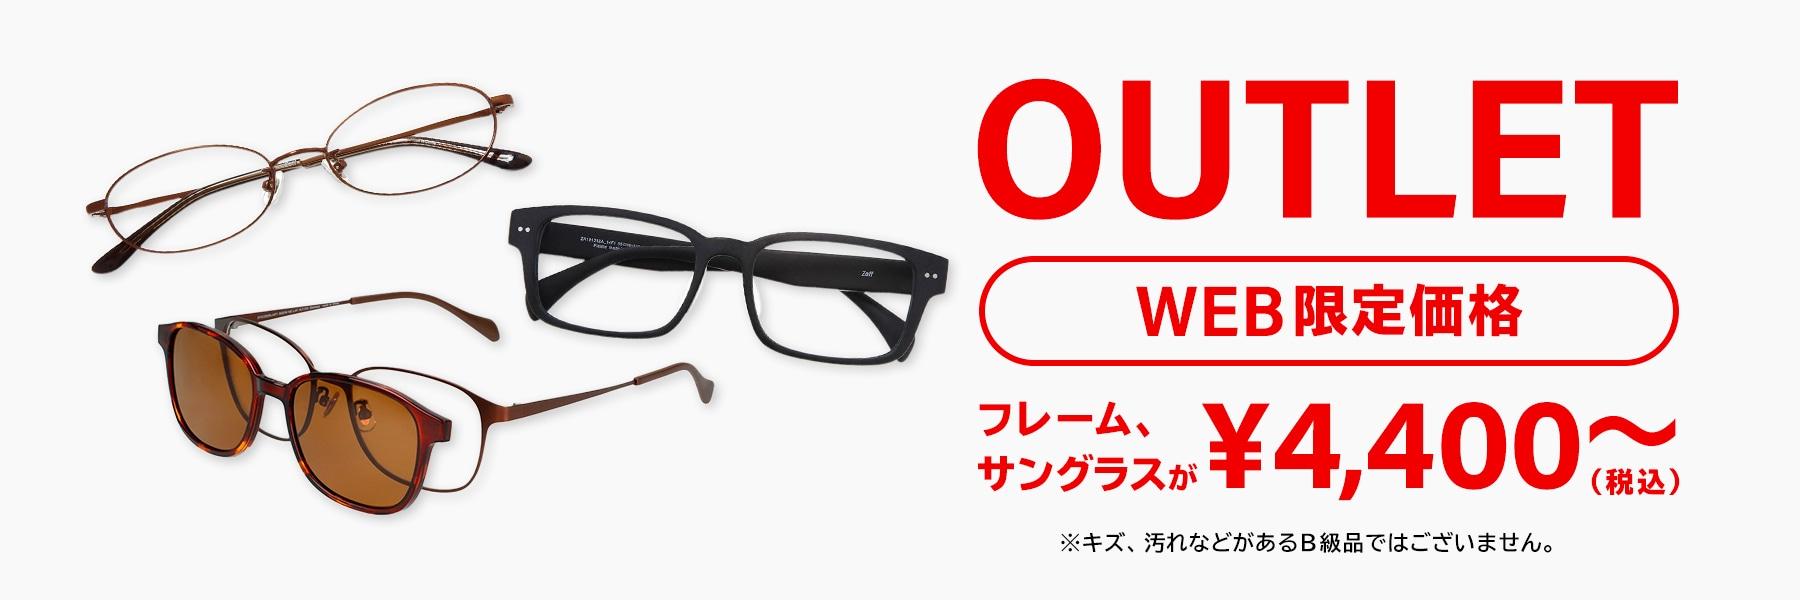 OUTLET WEB限定価格 メガネ(セットレンズ込み)サングラス ¥3,900(税別)